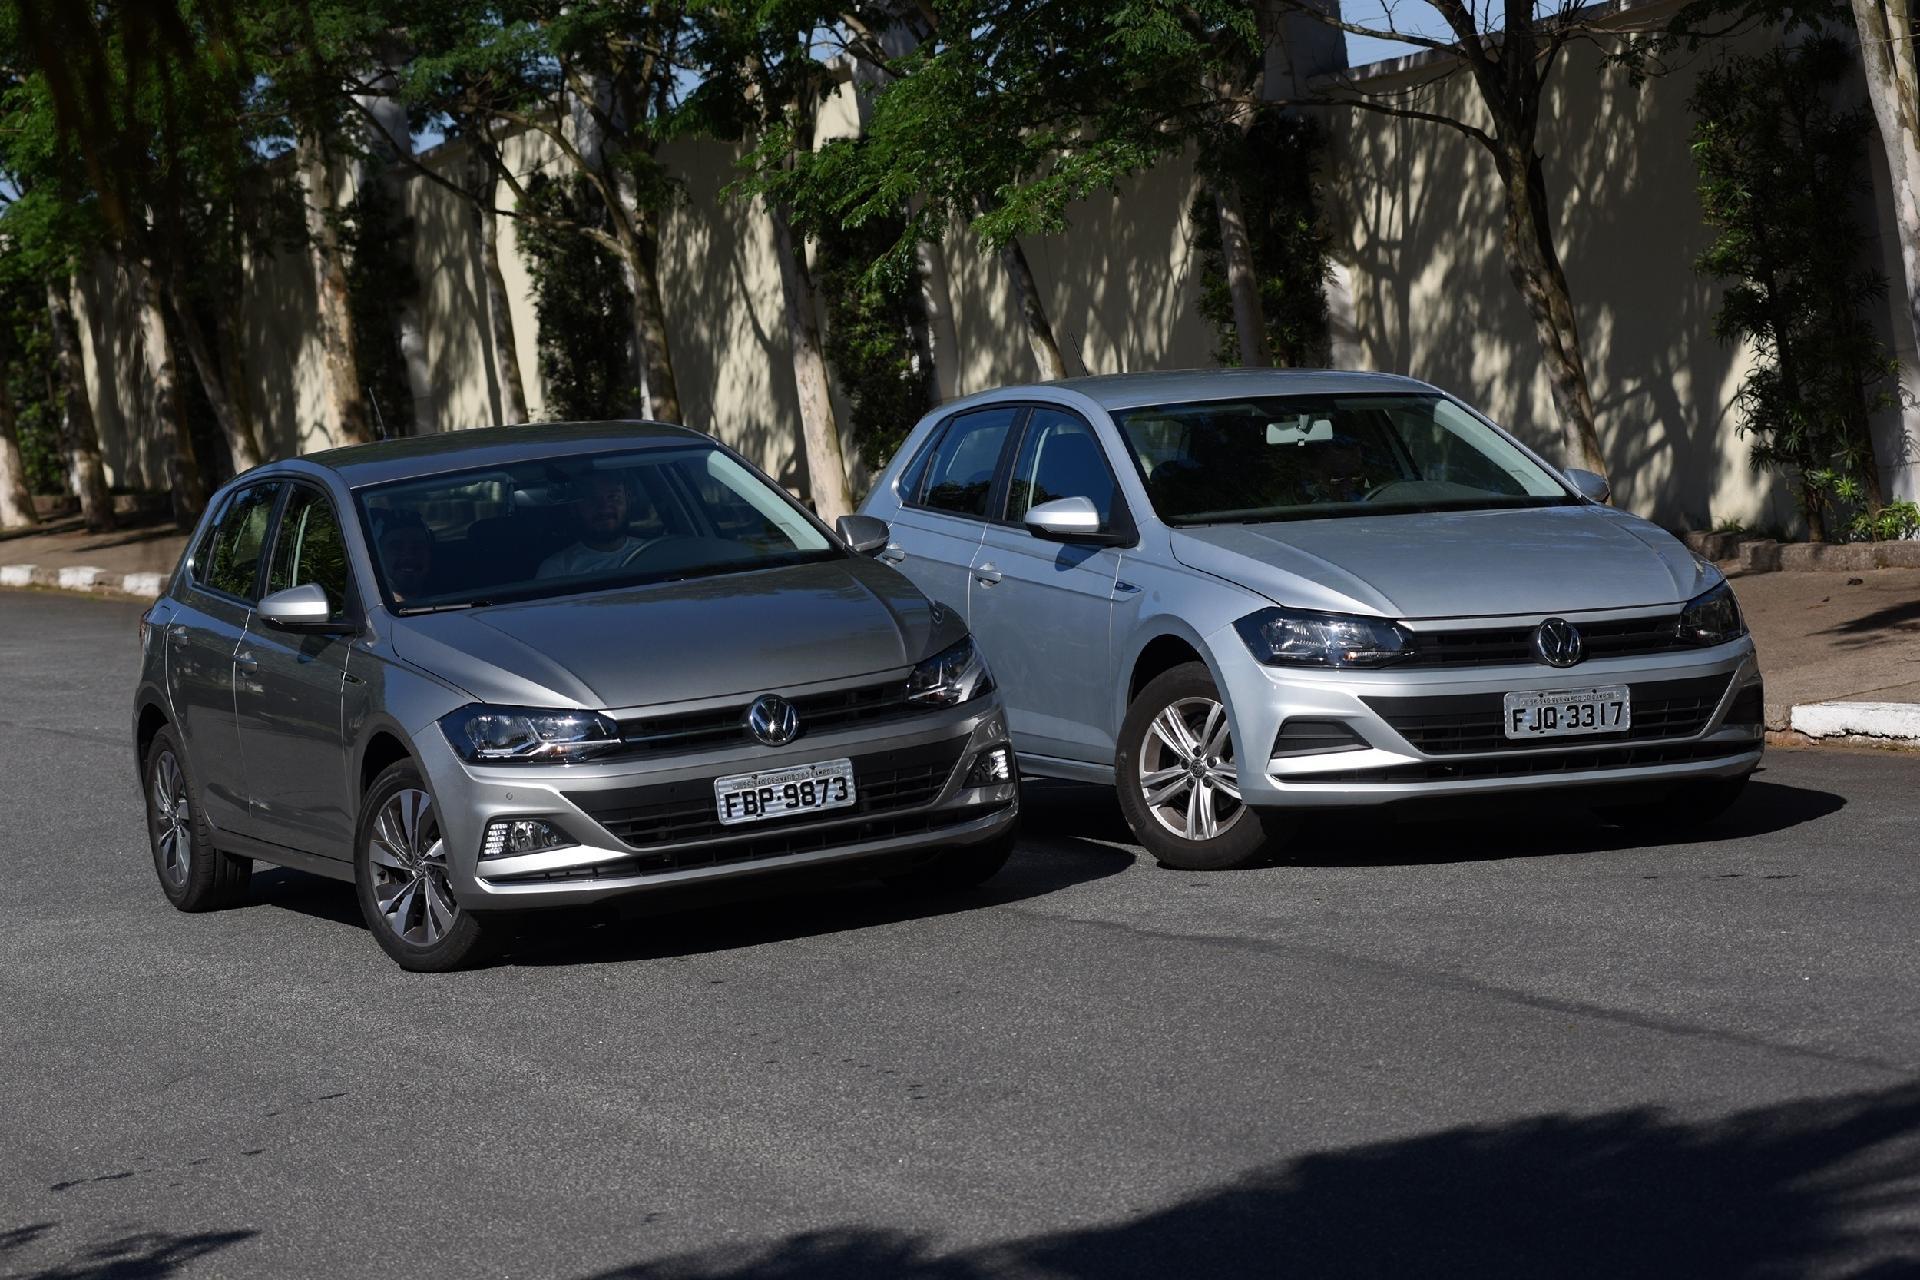 be48cfd3d3 Volkswagen Polo 1.6 contra Polo 1.0 turbo  qual é a melhor compra